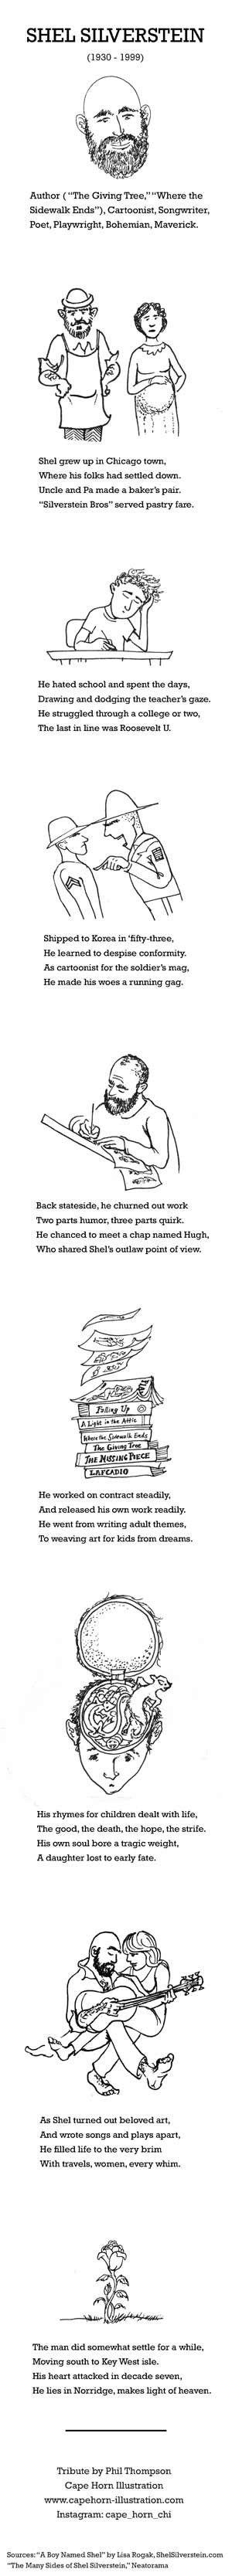 Shel Silverstein illustrated biography